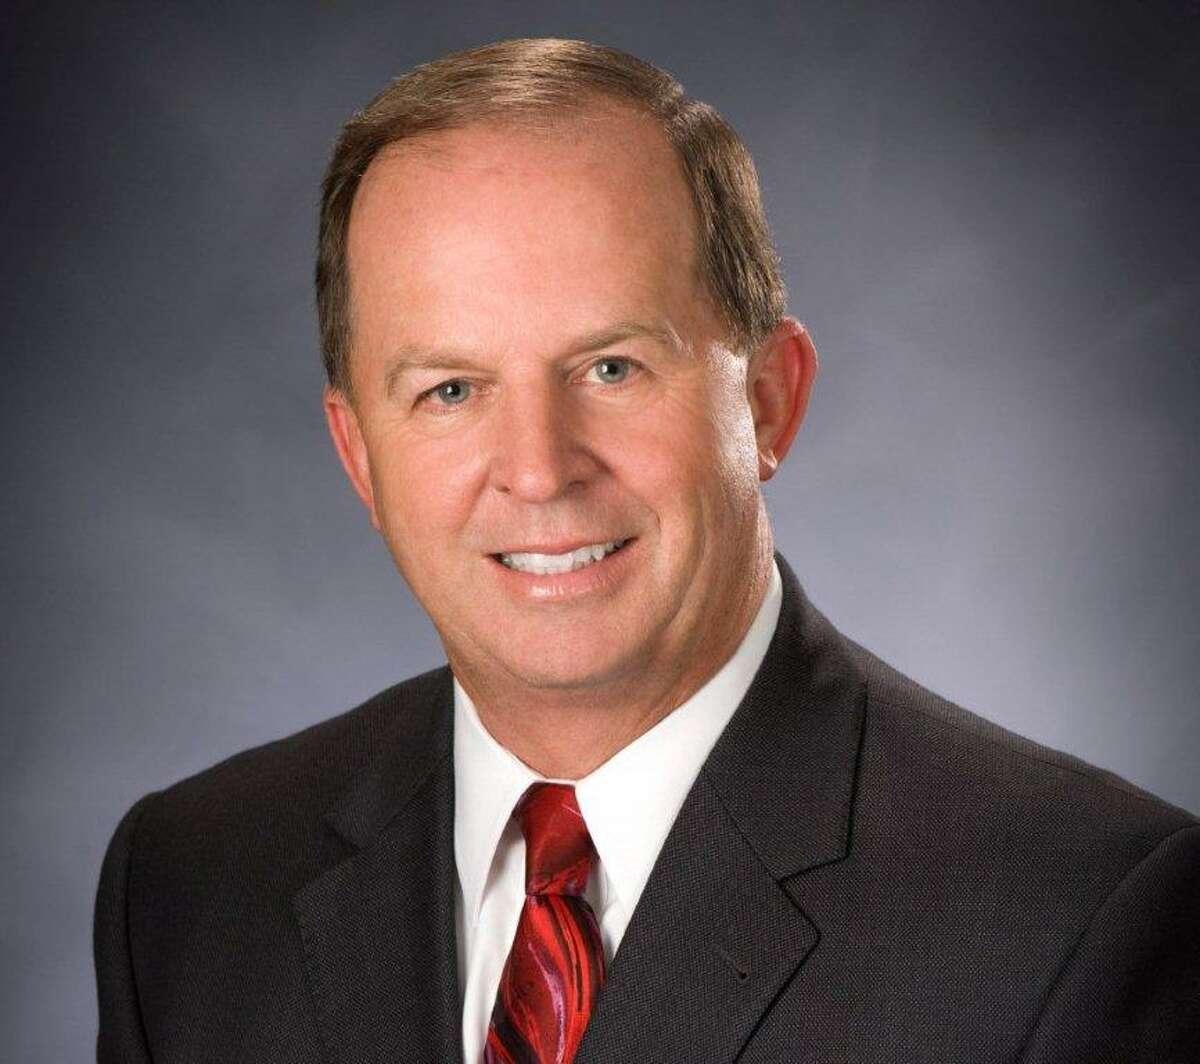 State Rep. Wayne Faircloth